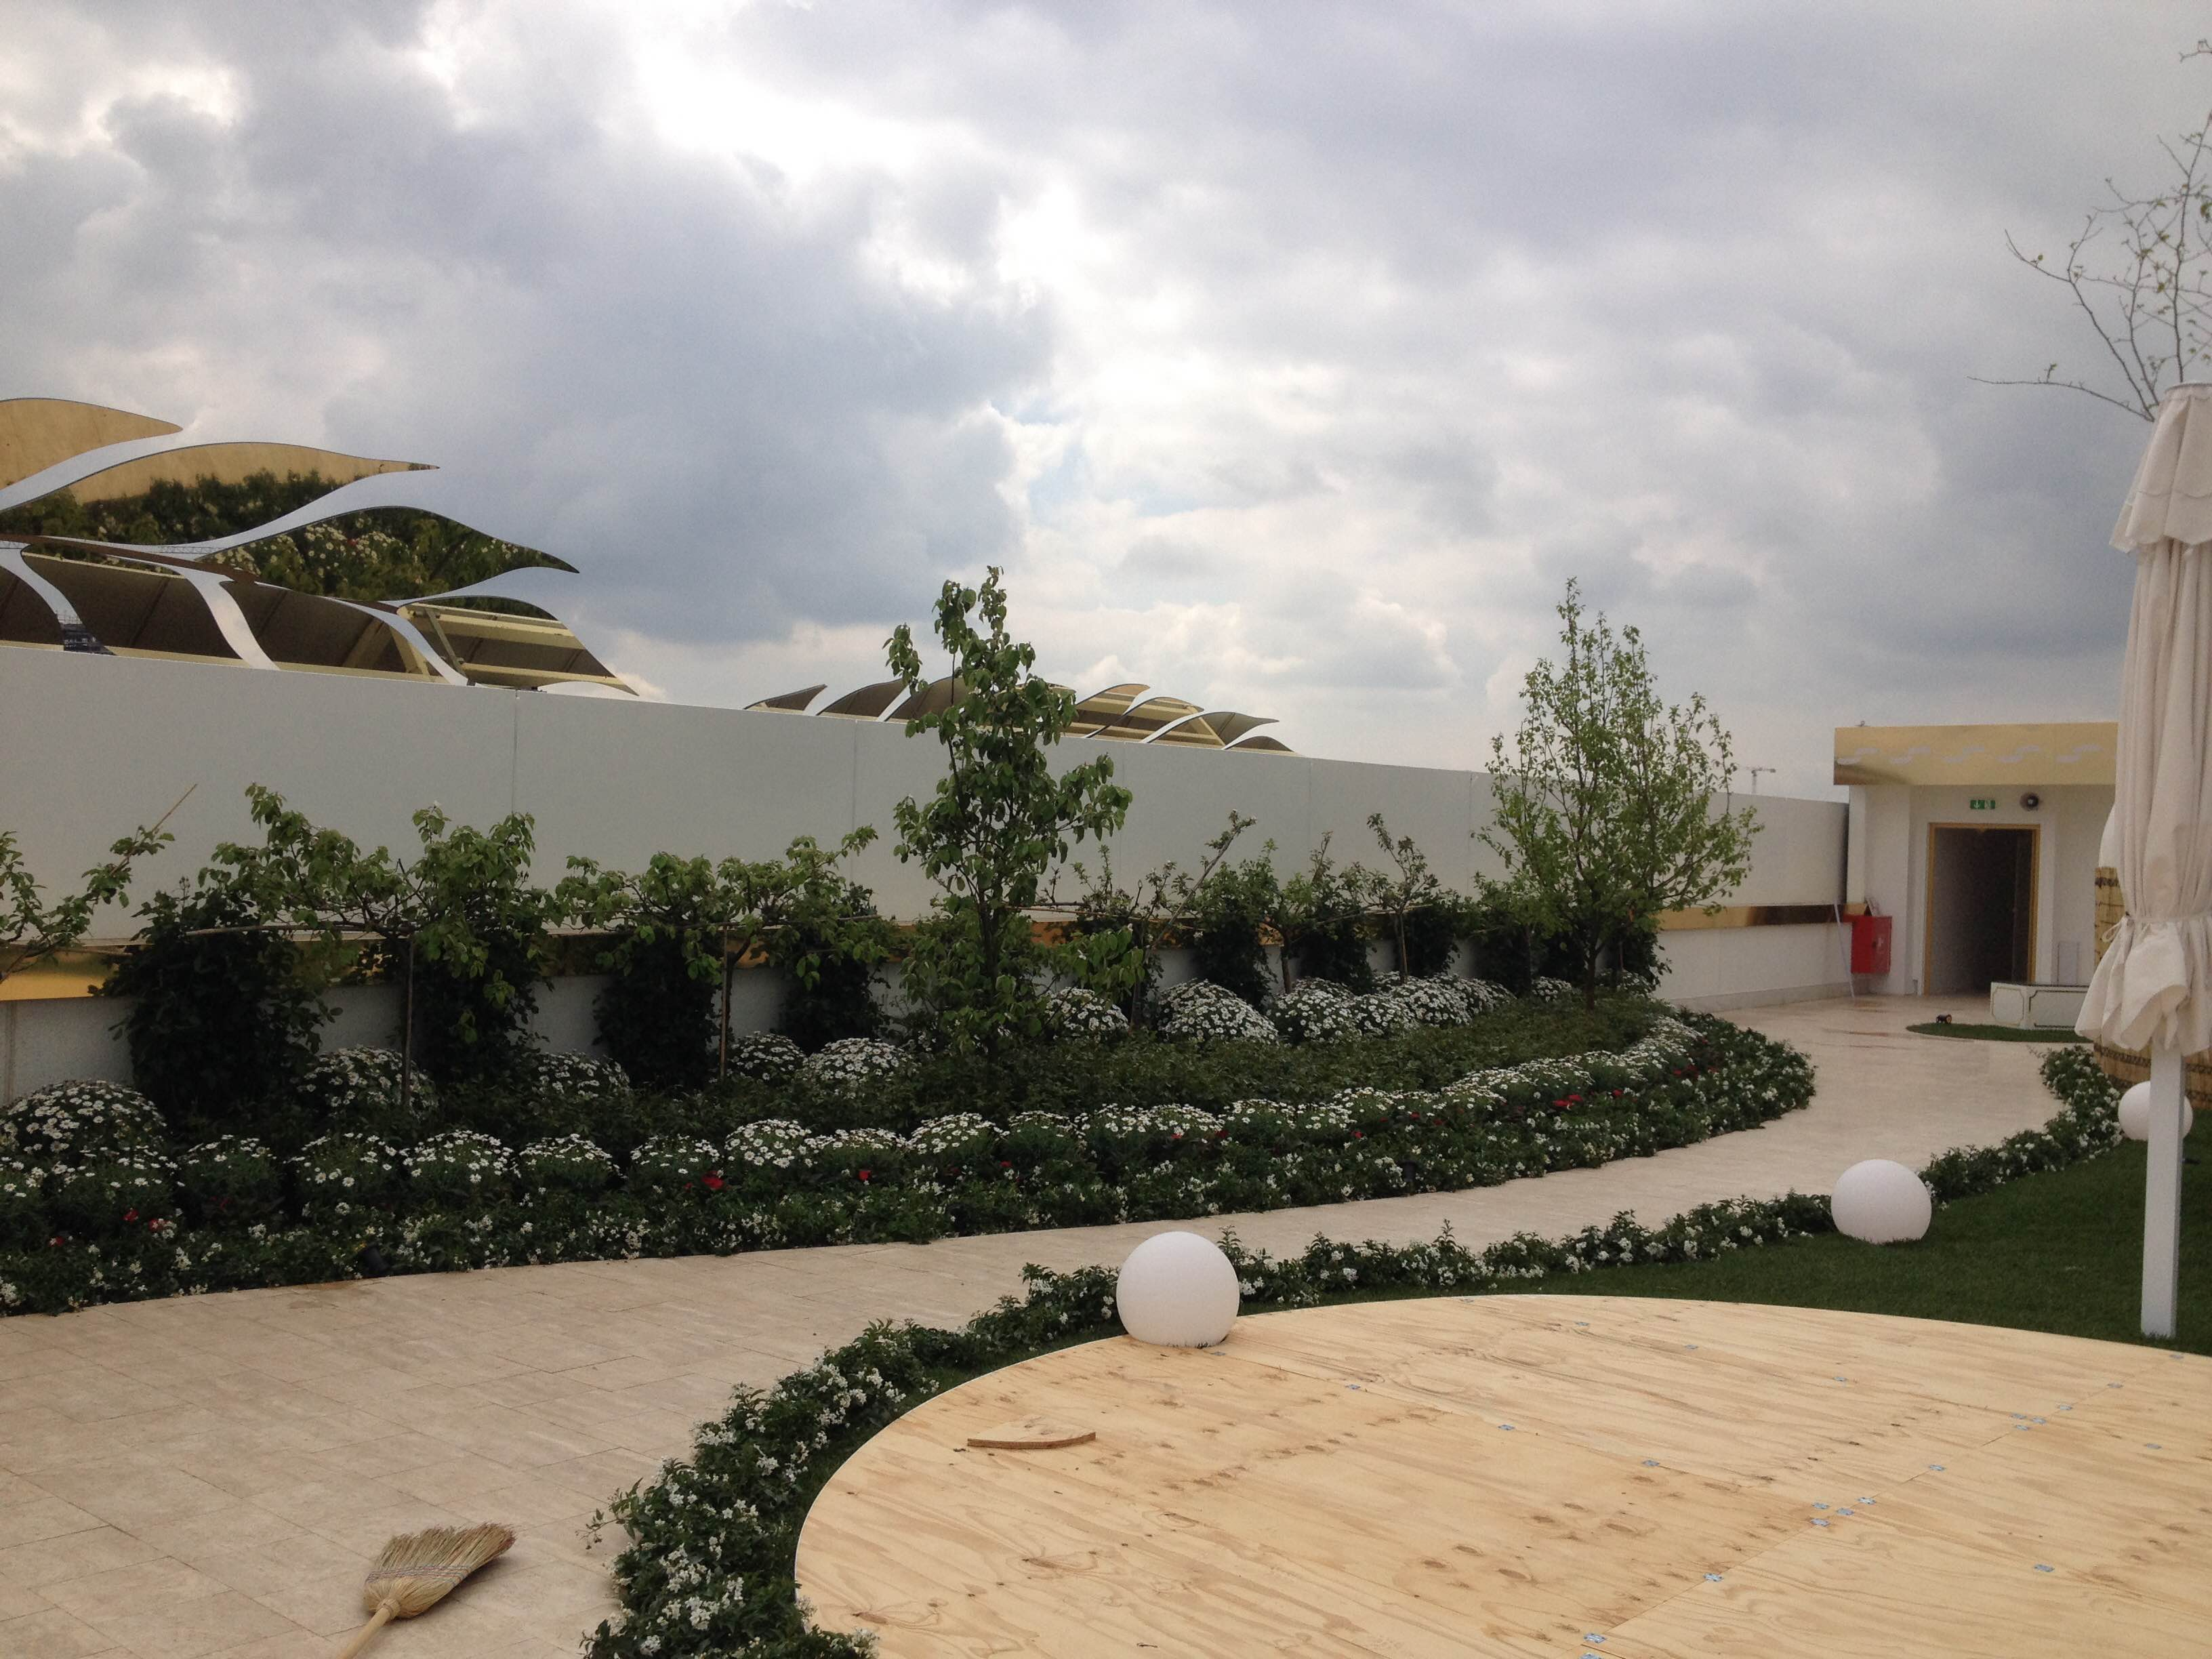 EXPO - Turmekistan